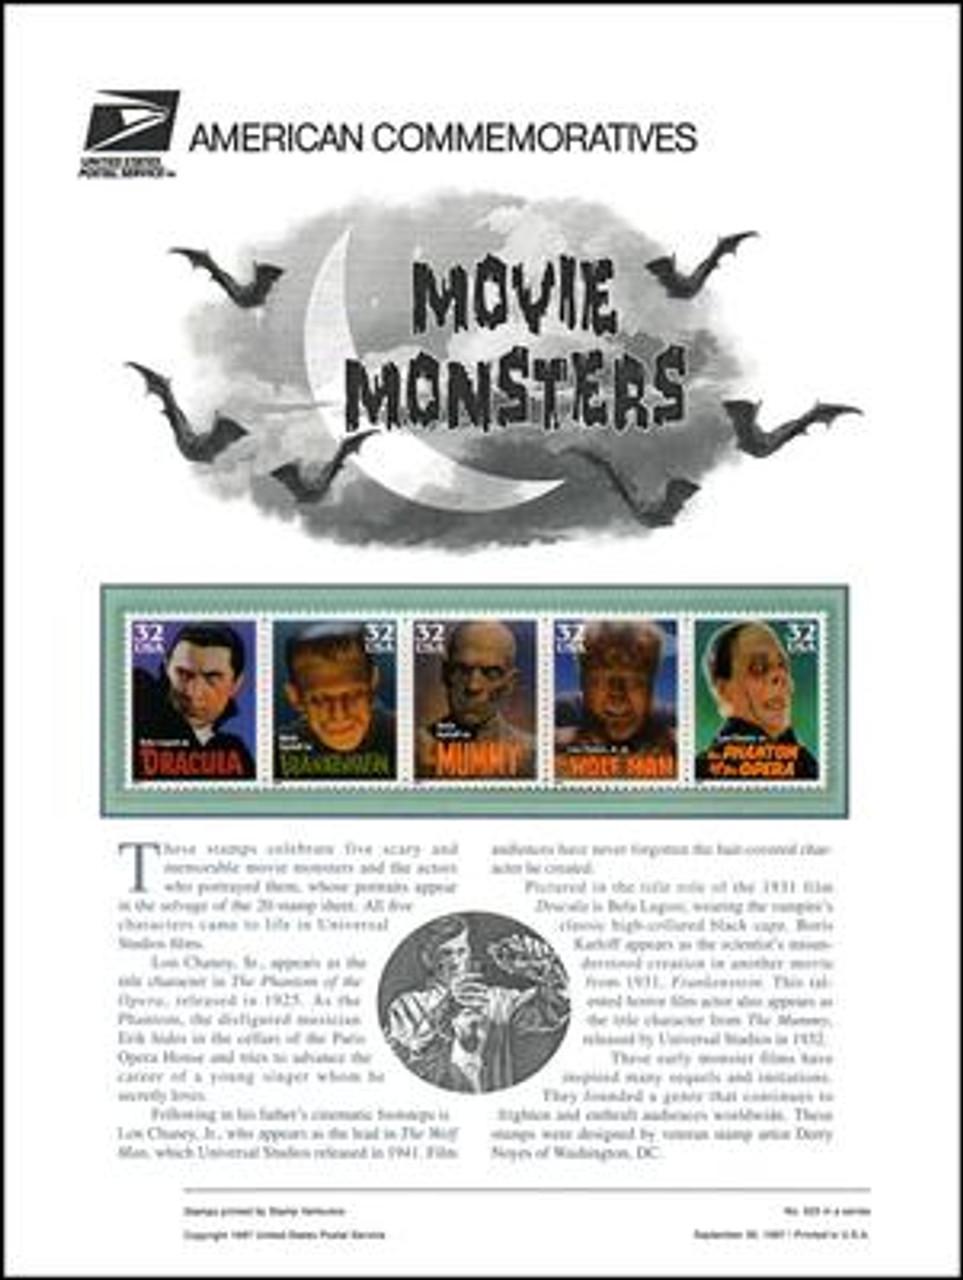 3168 - 3172 / 32c Movie Monsters 1997 USPS American Commemorative Panel Sealed #525